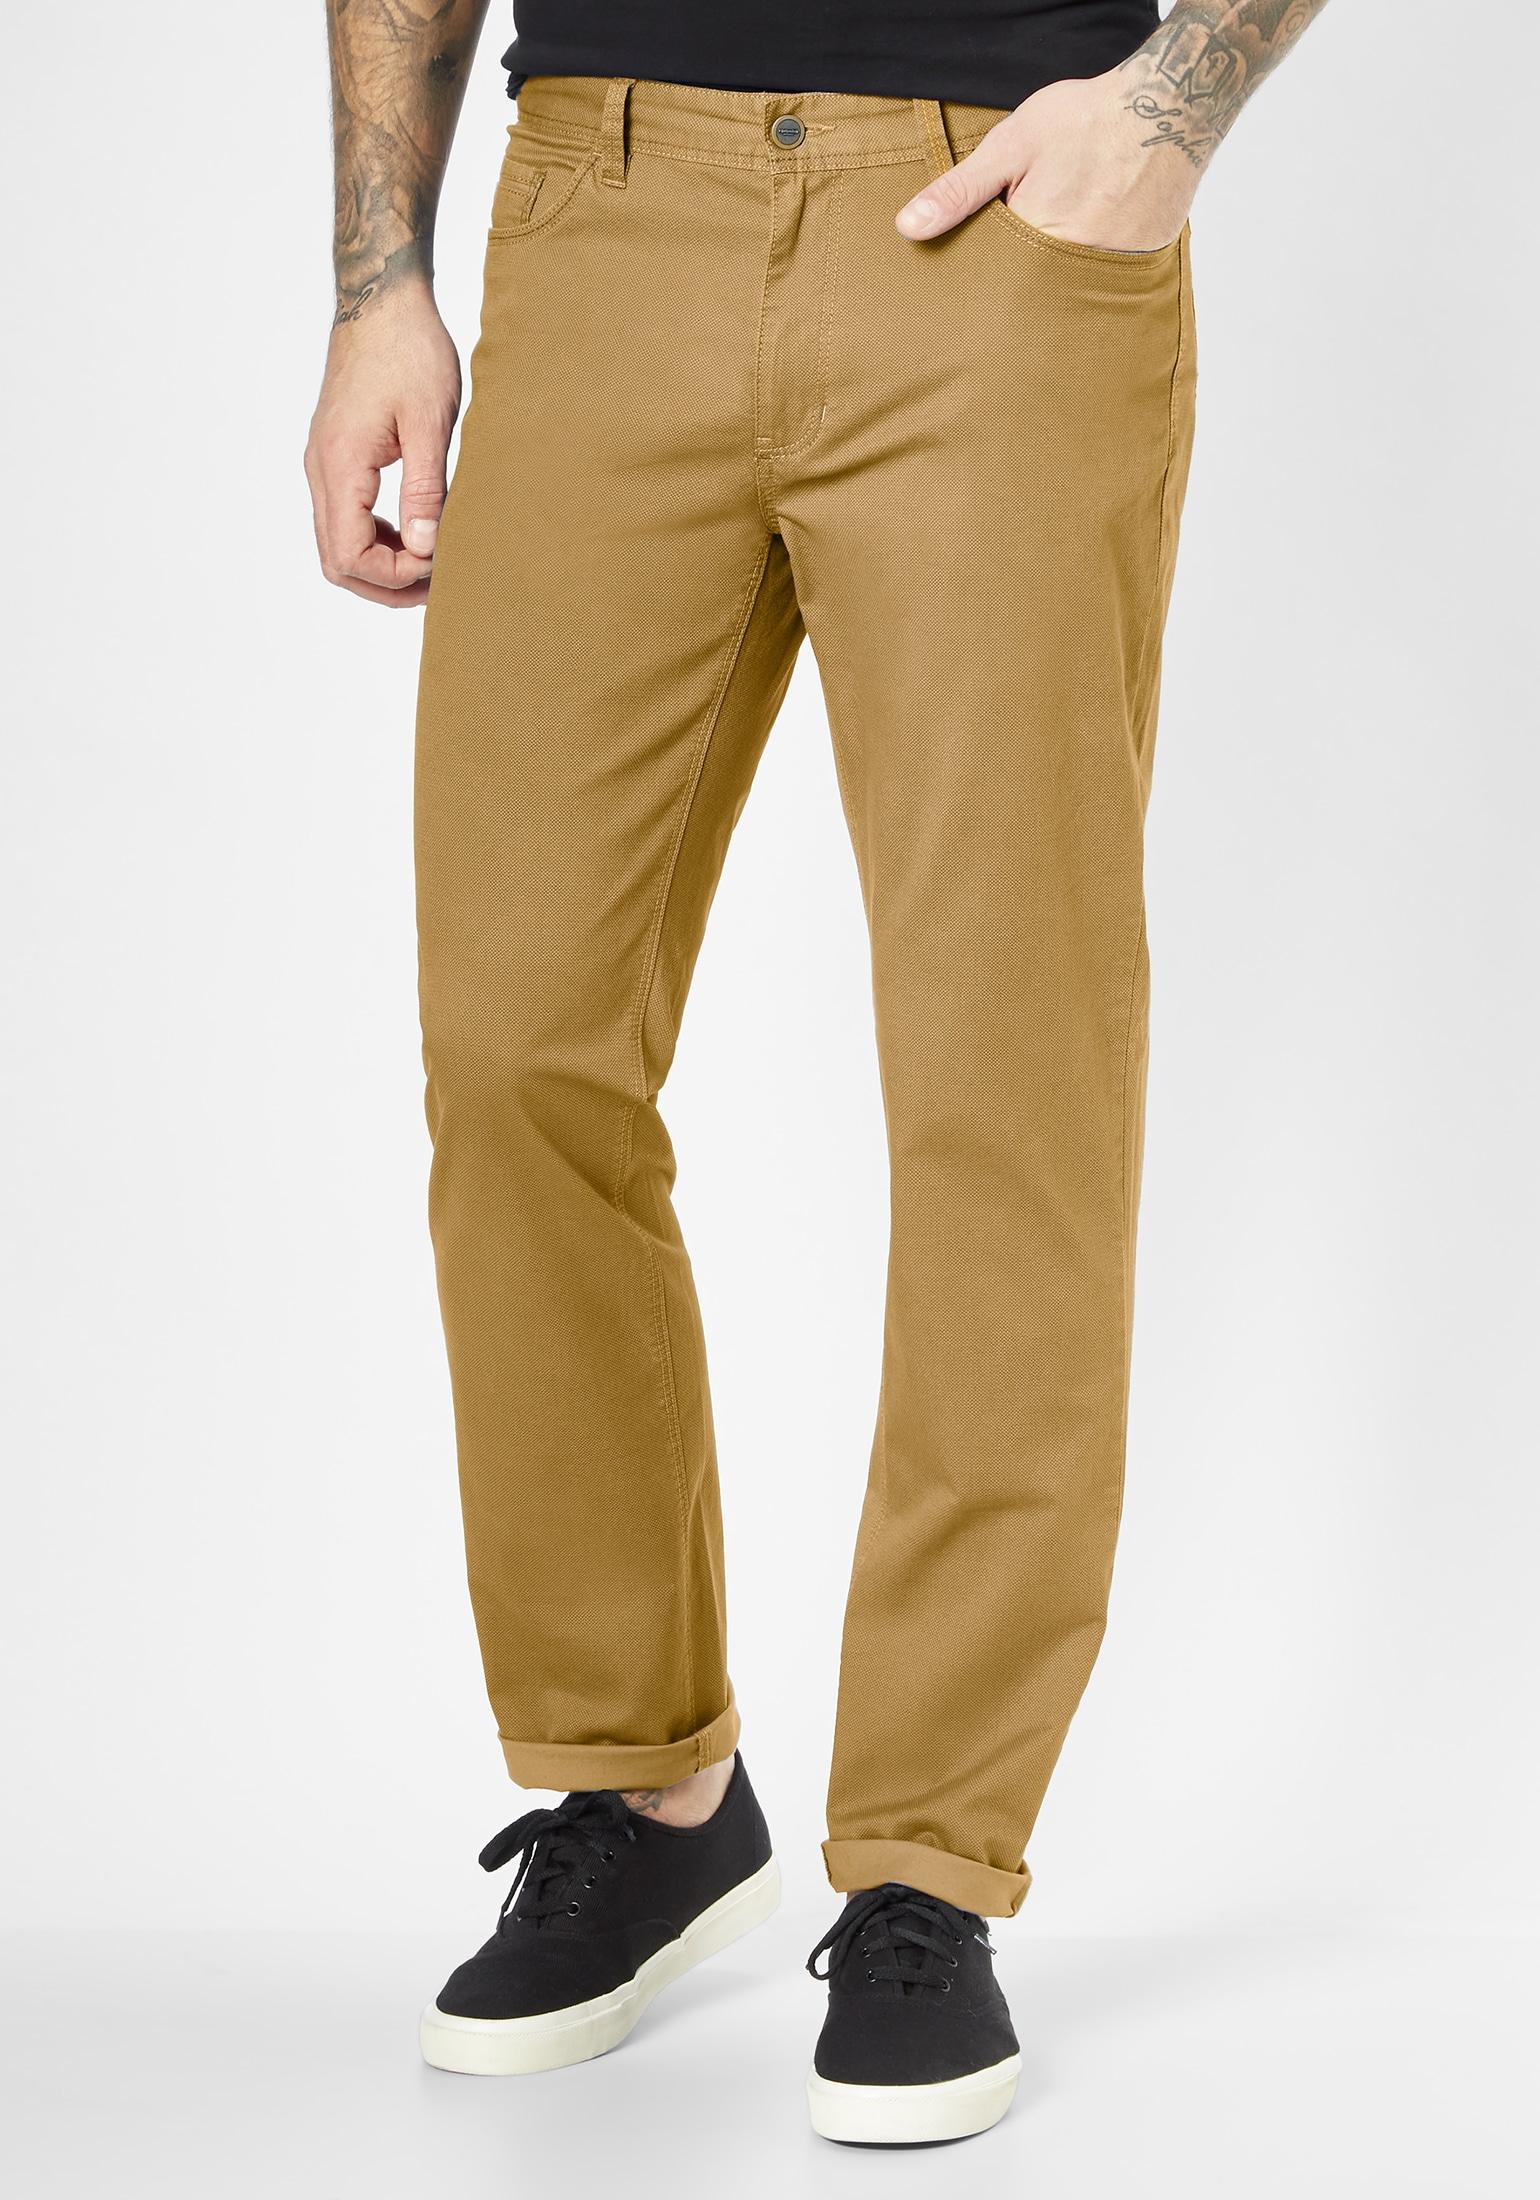 redpoint -  Stoffhose Milton, dezent bedruckt, modern fit 5-Pocket